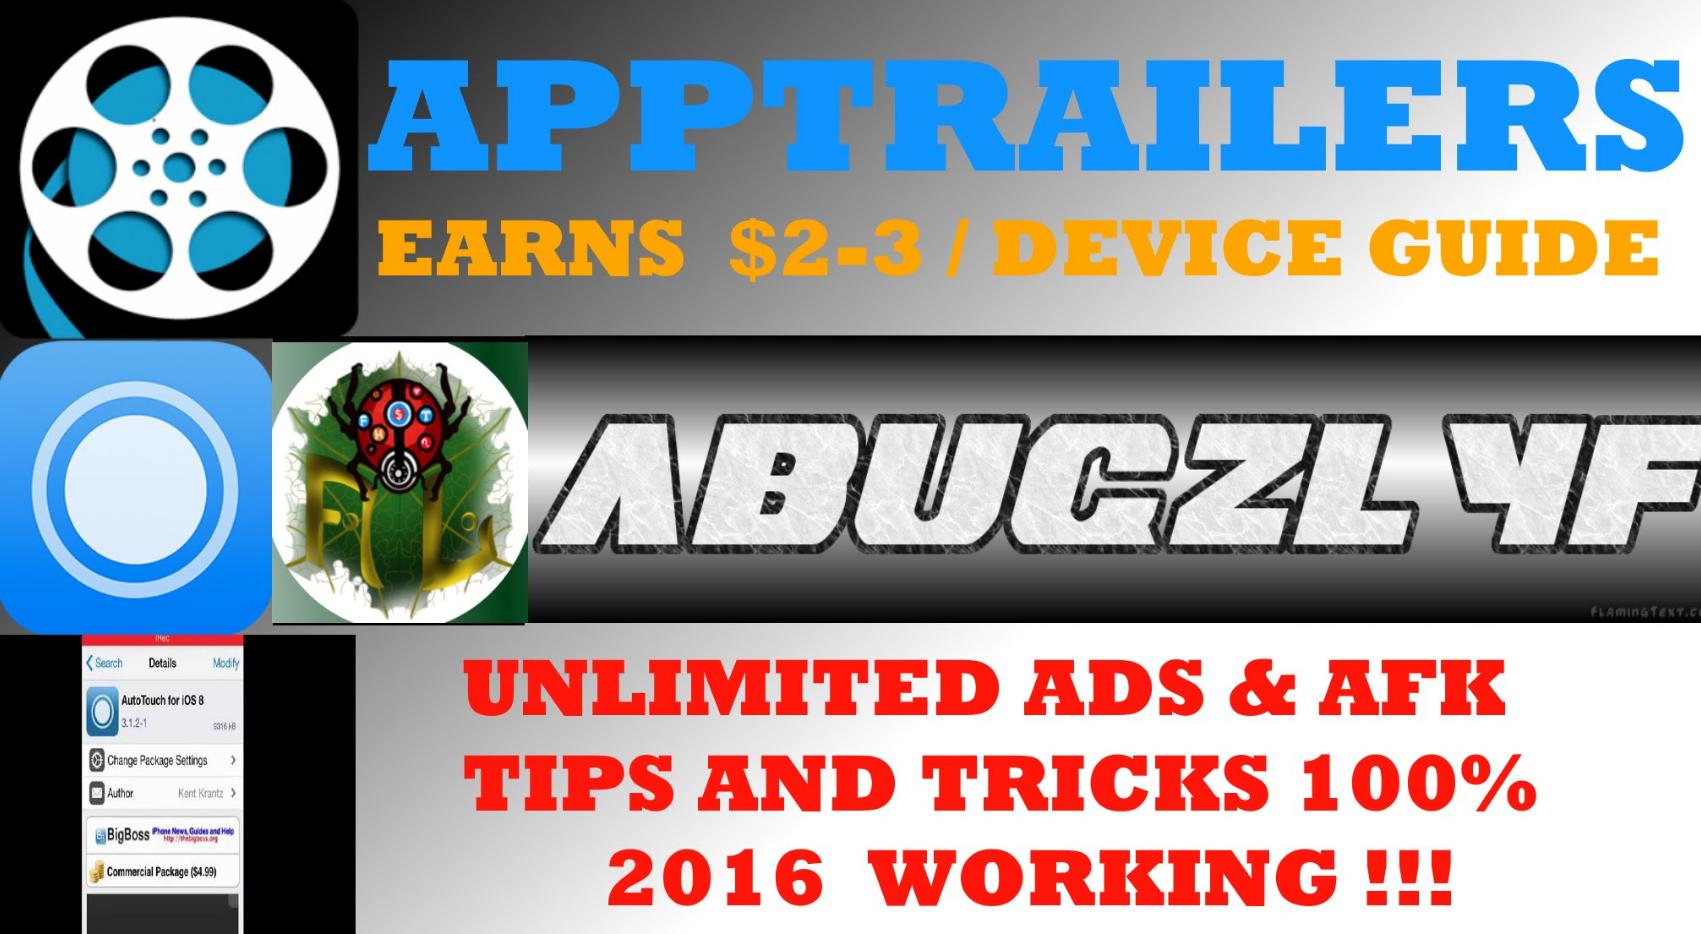 AppTrailers Ads